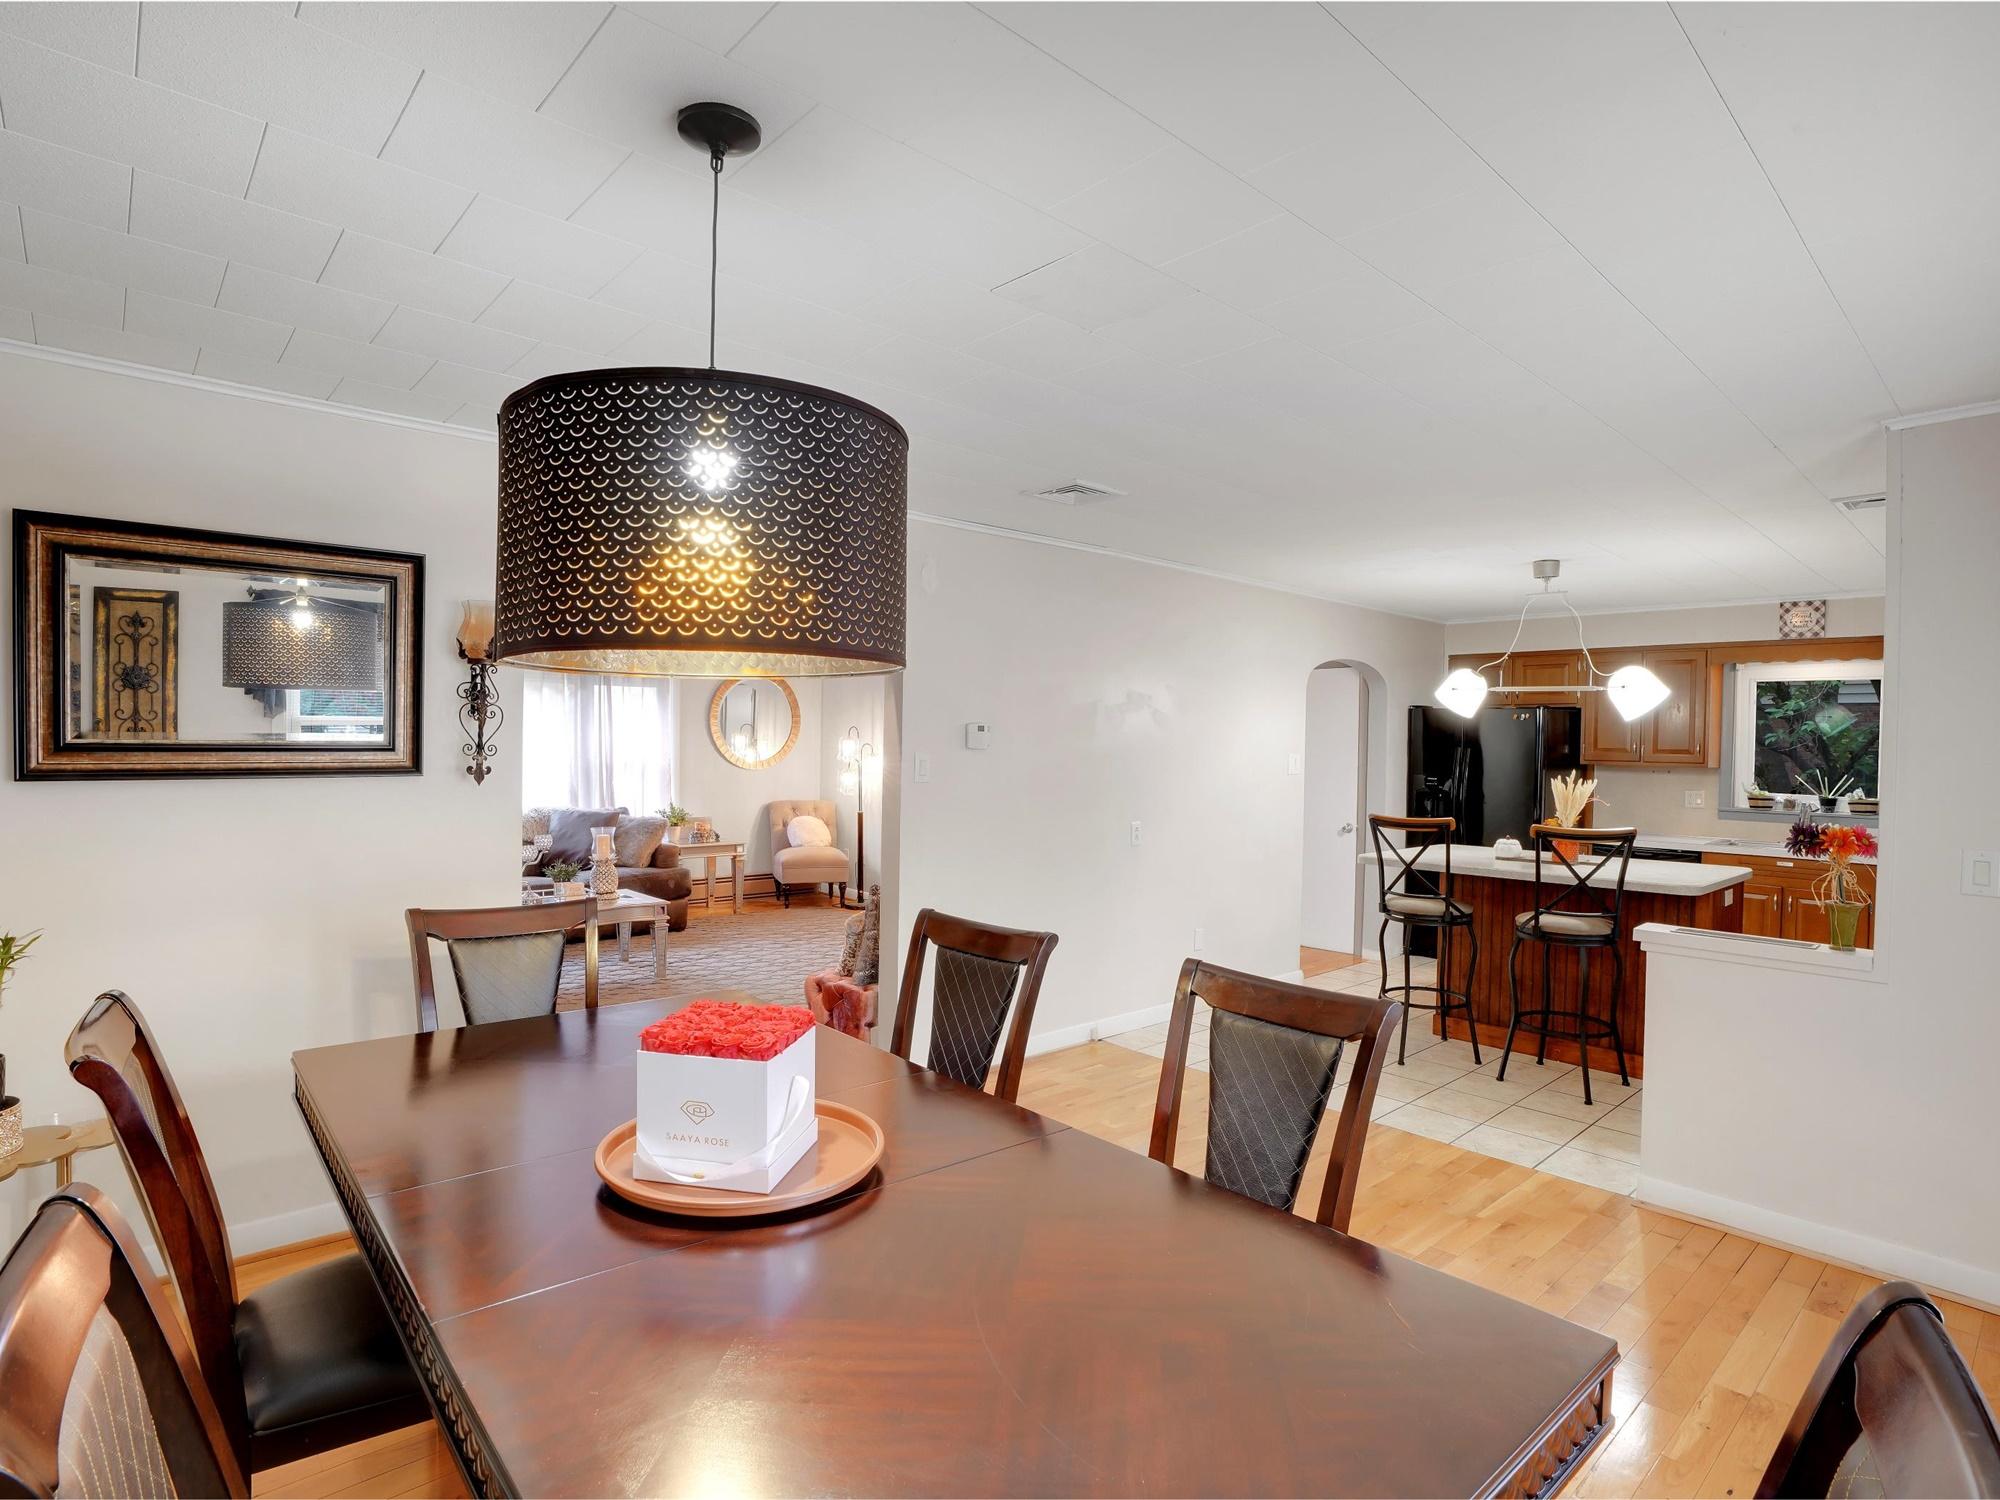 2022 Kline ST - Dining room